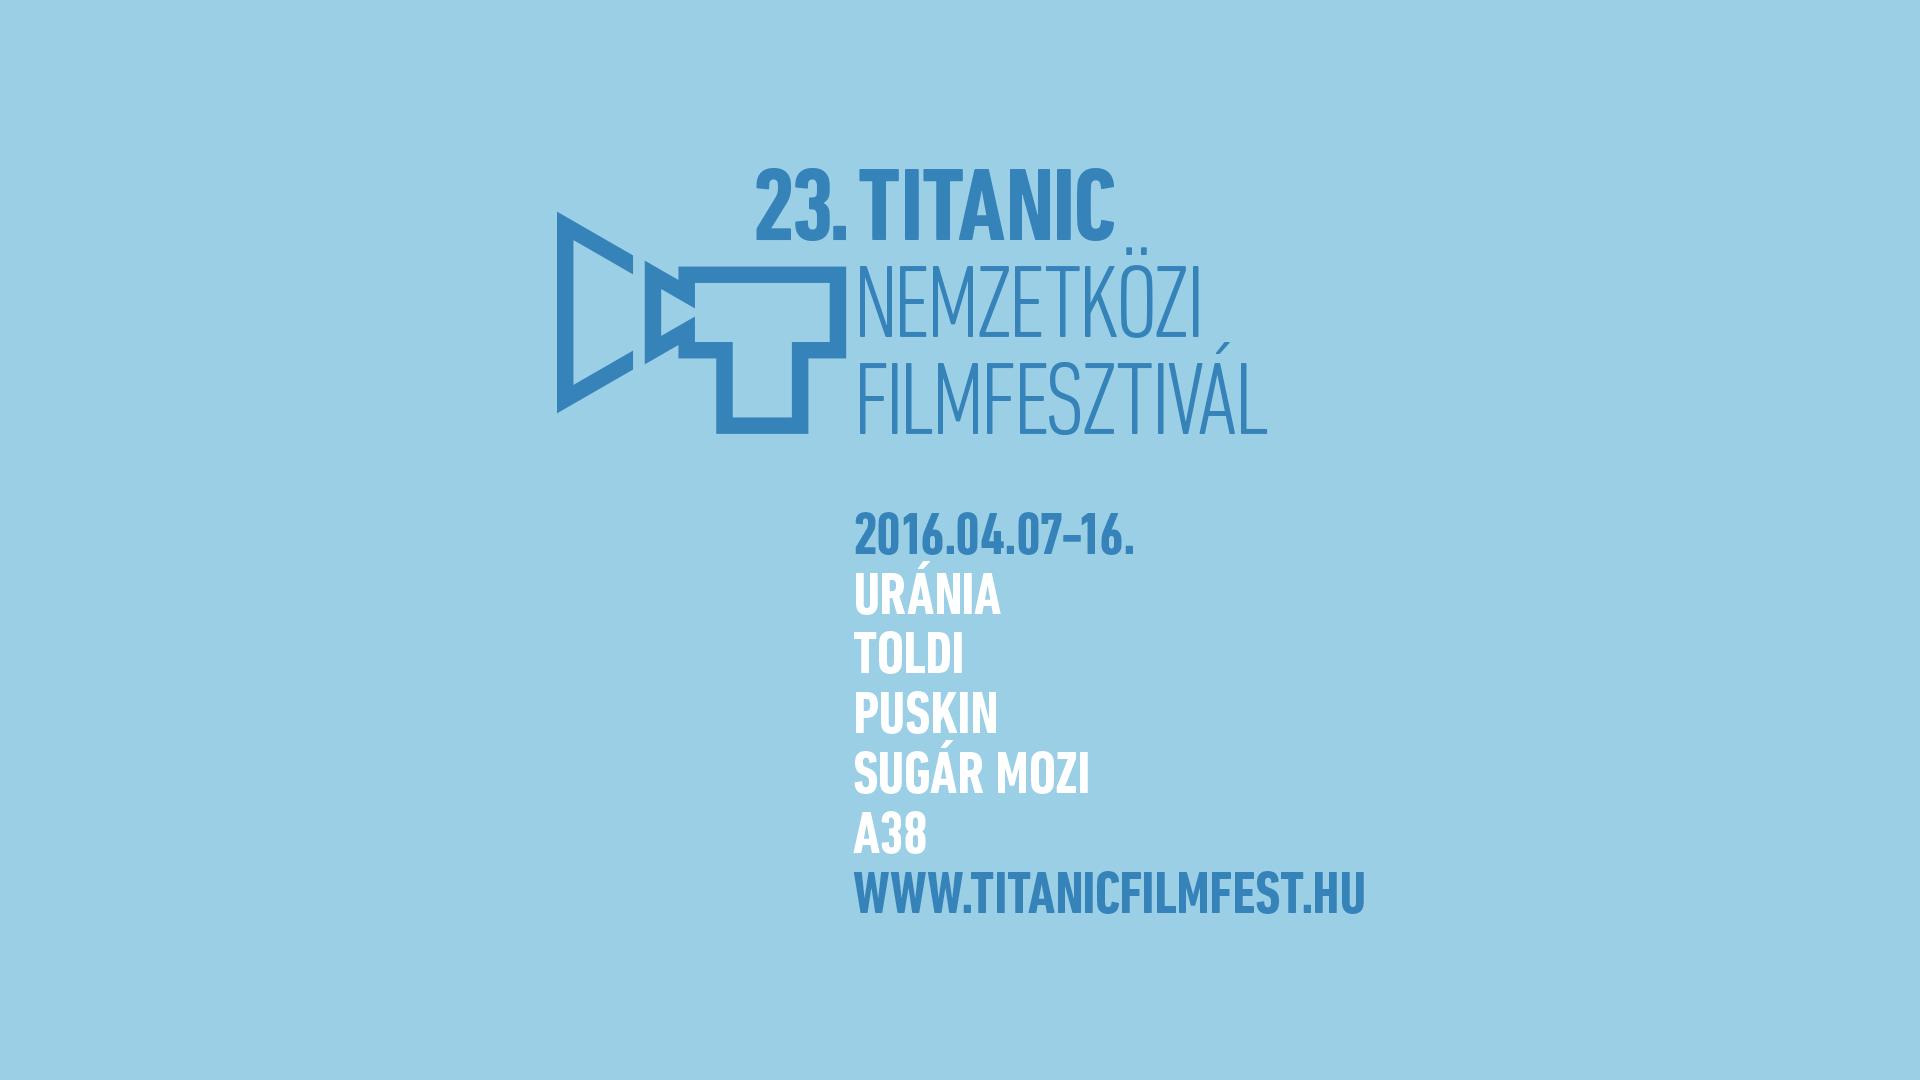 titanicfilmfest_anim_logo_4.png